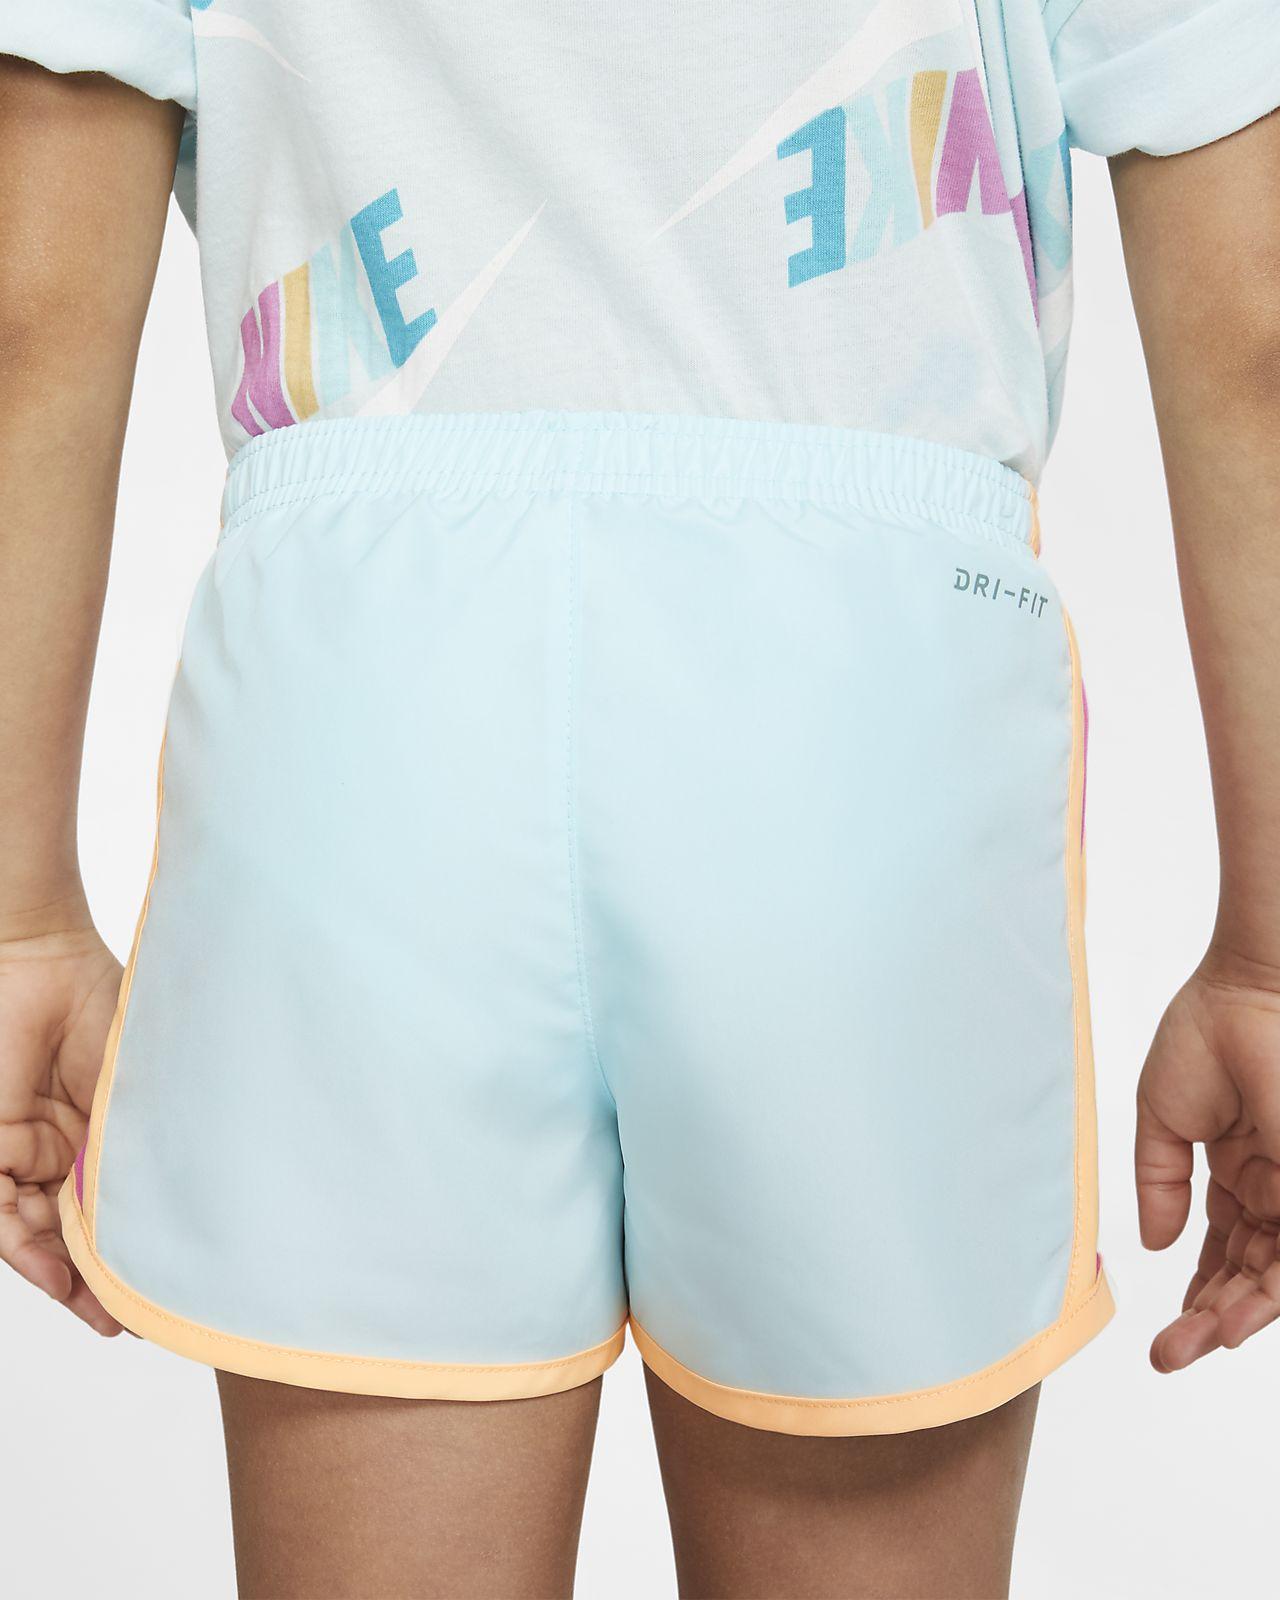 a9d213325b Nike Dri-FIT Tempo Little Kids' Running Shorts. Nike.com